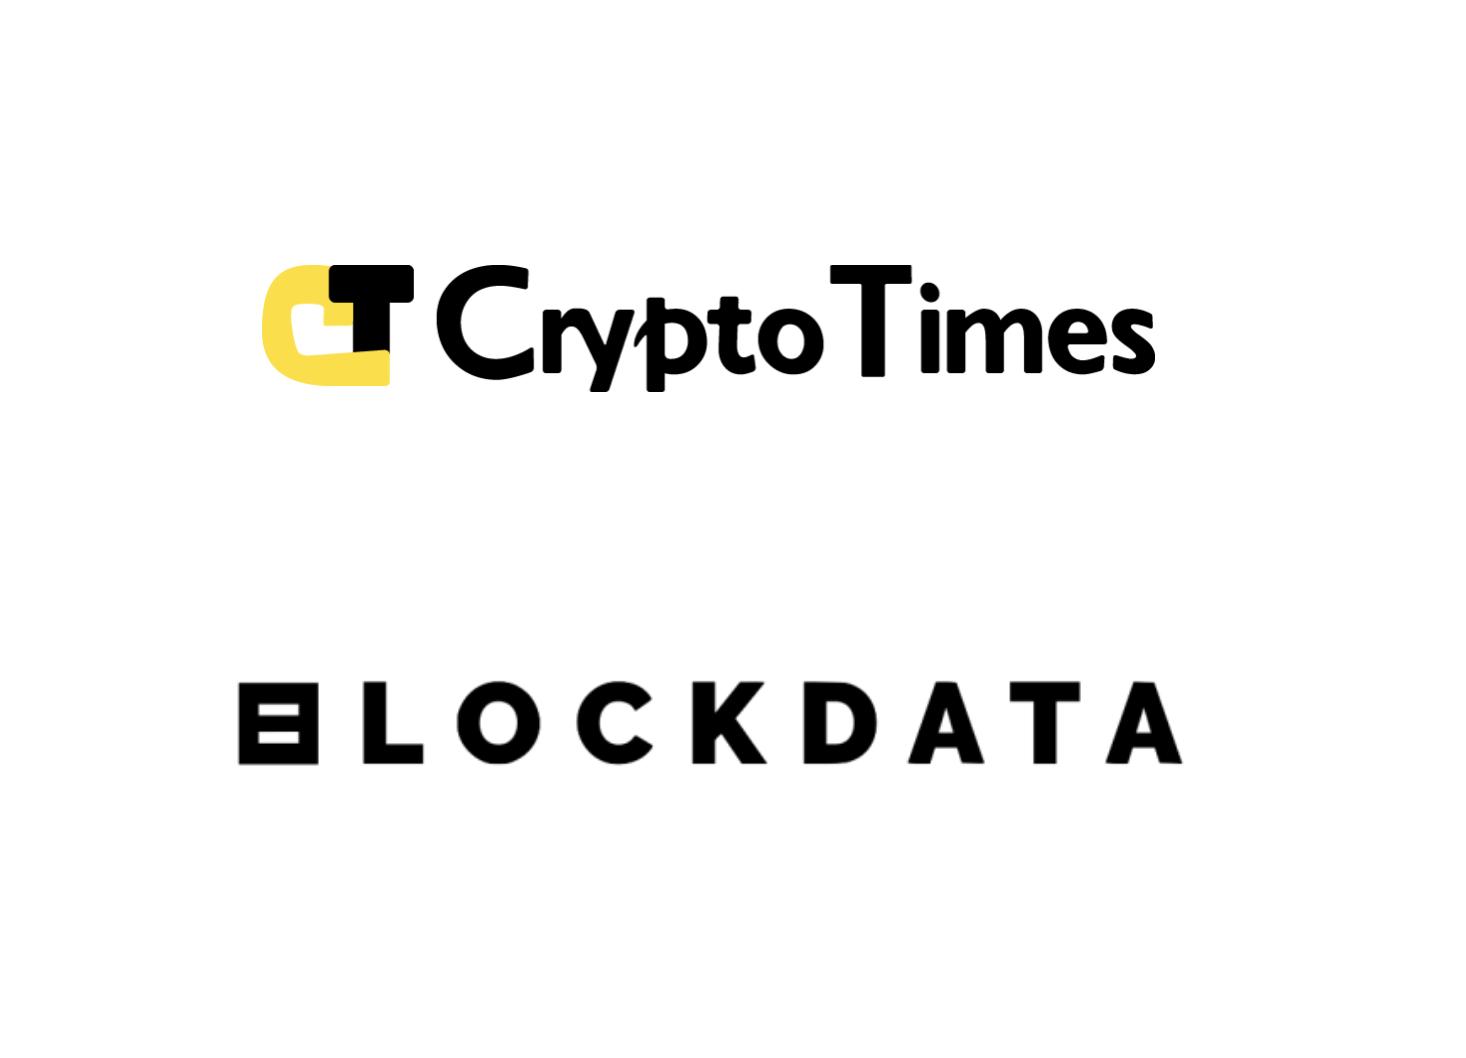 CRYPTO TIMESがBLOCKDATAと正式に業務提携を発表、また、CT Analysisの第5回『Asset Tokenization国内/海外動向』を本日より無料公開